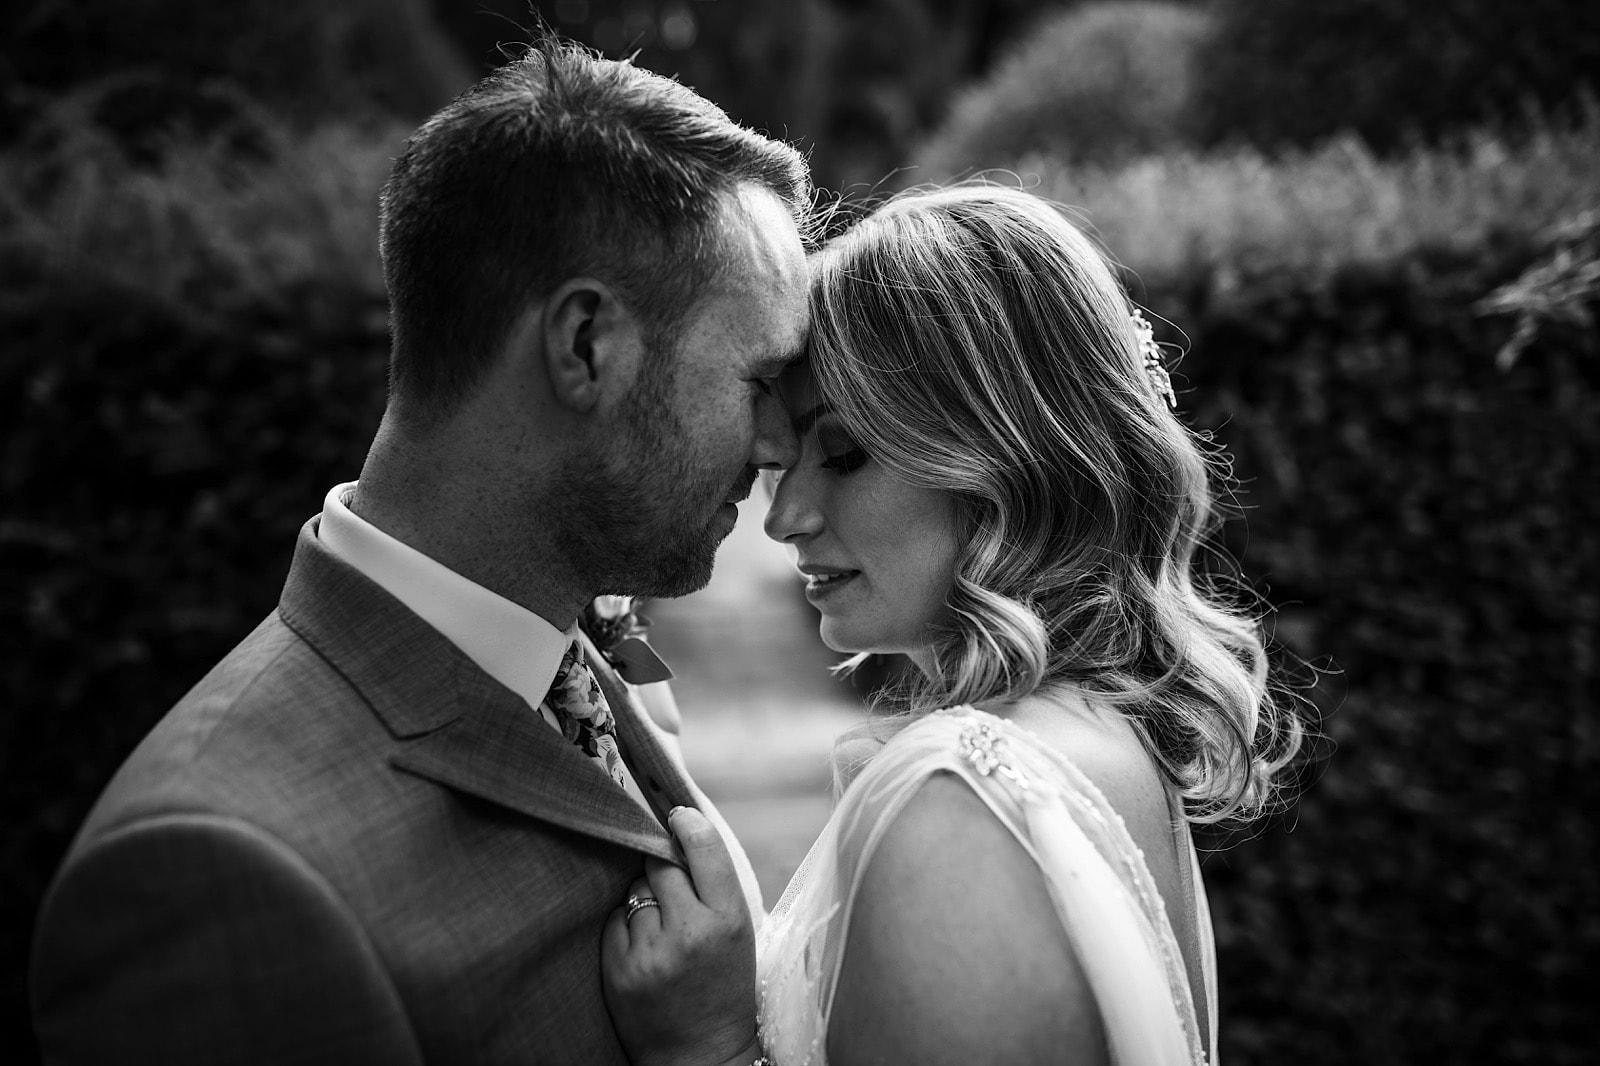 birtsmorton court wedding photography 0045